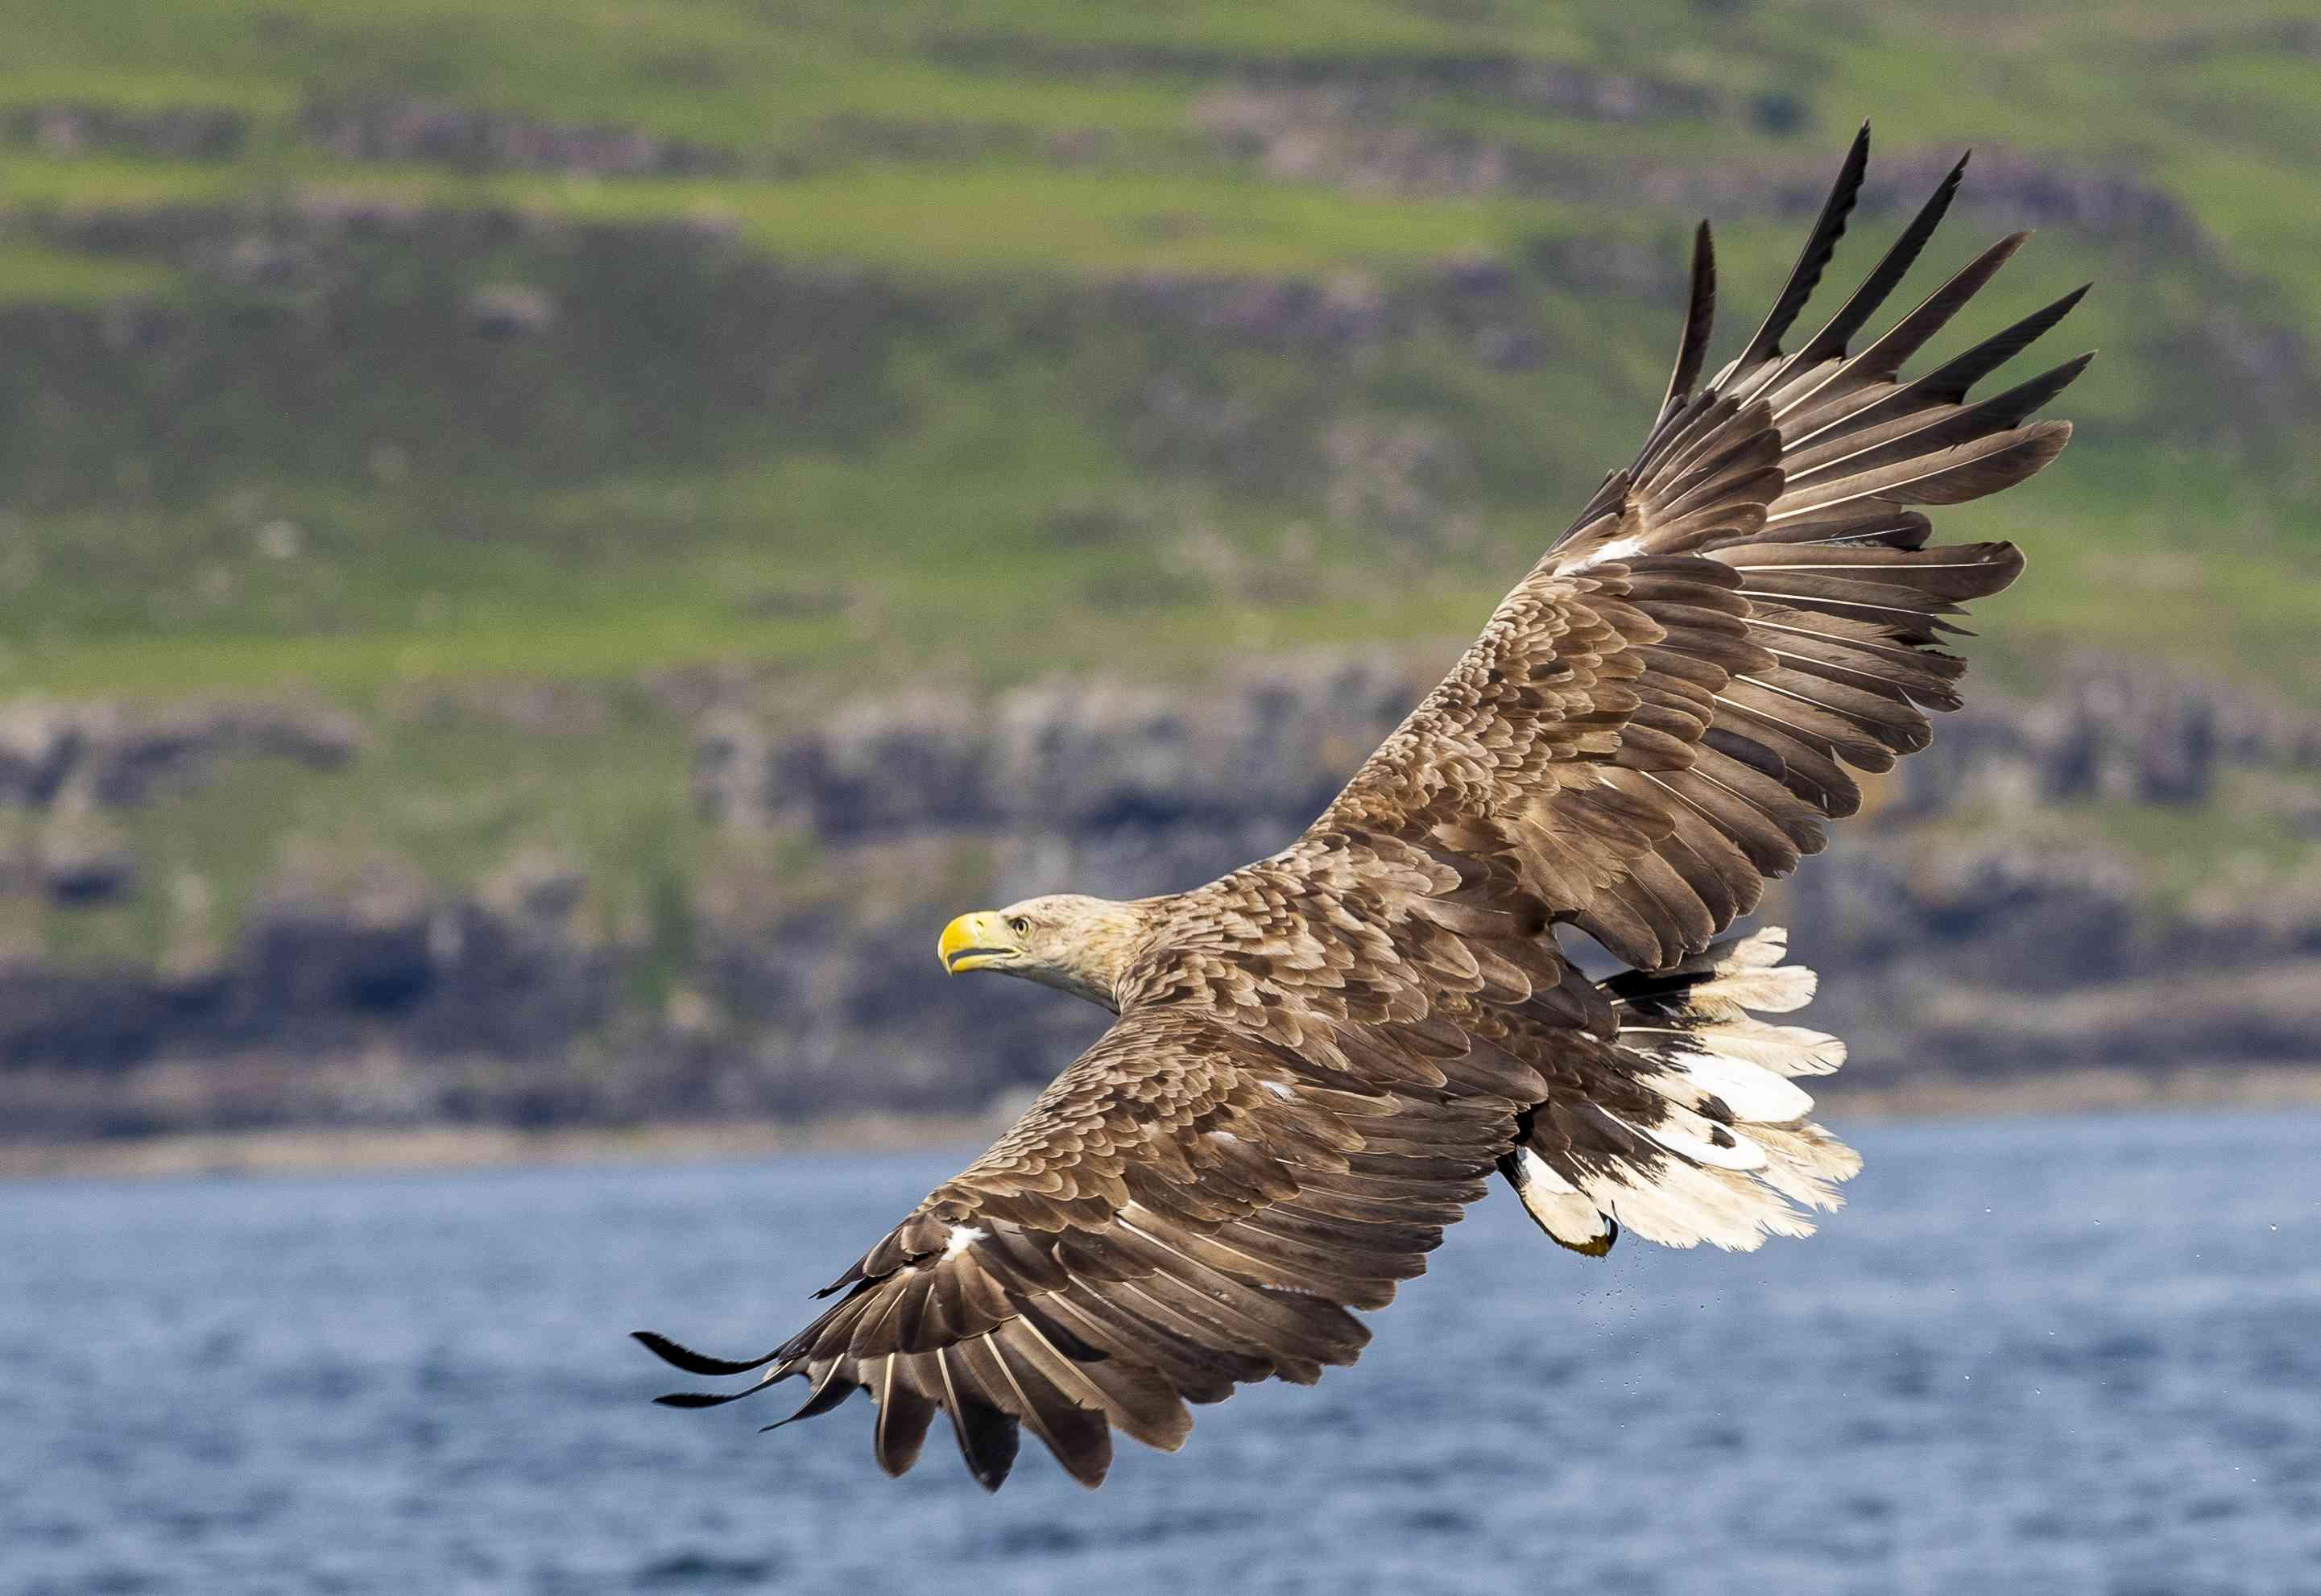 White-tailed sea eagle in flight, Isle of Mull